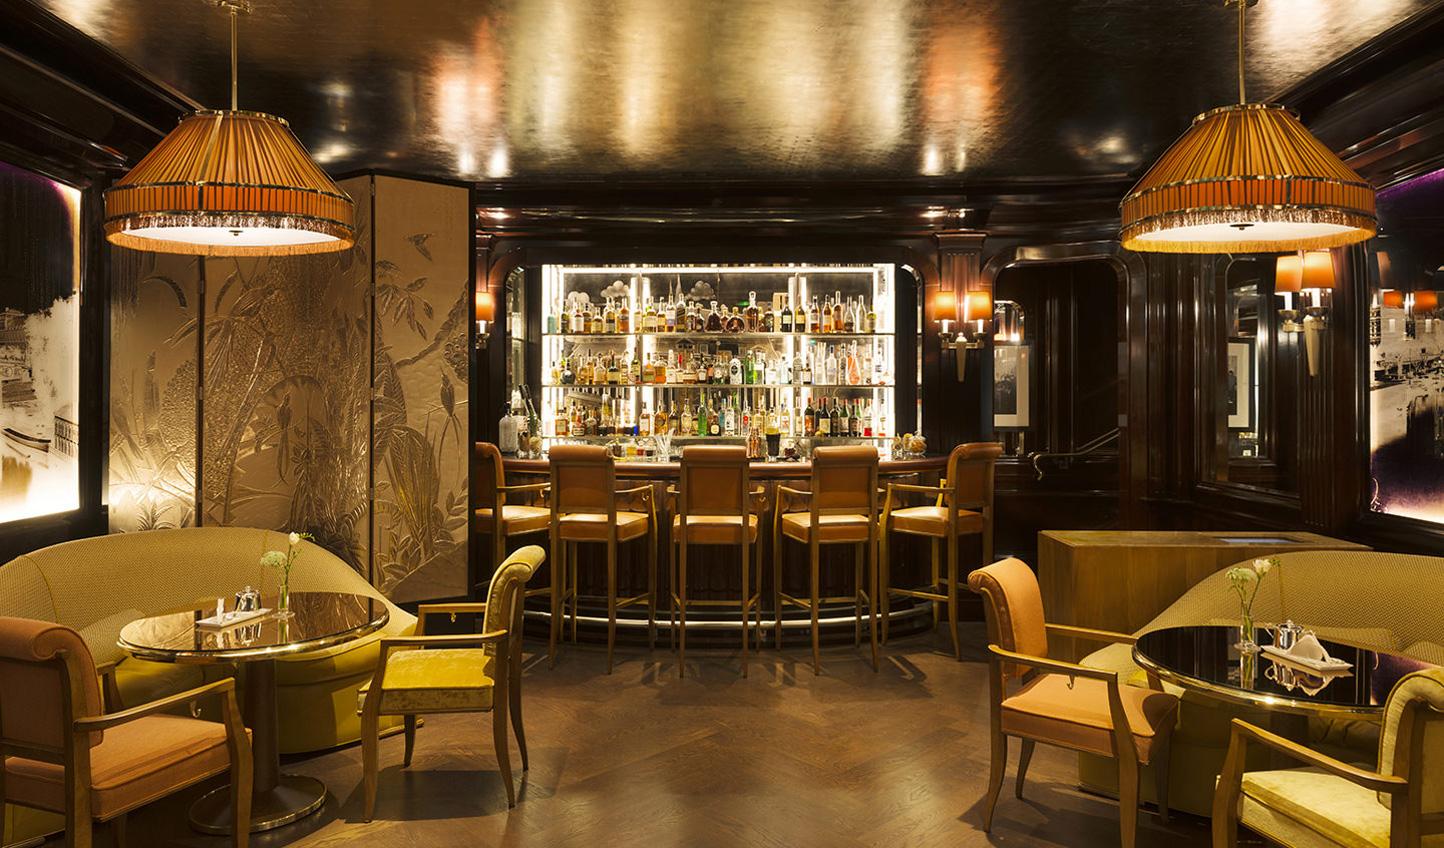 The chic Ritz bar